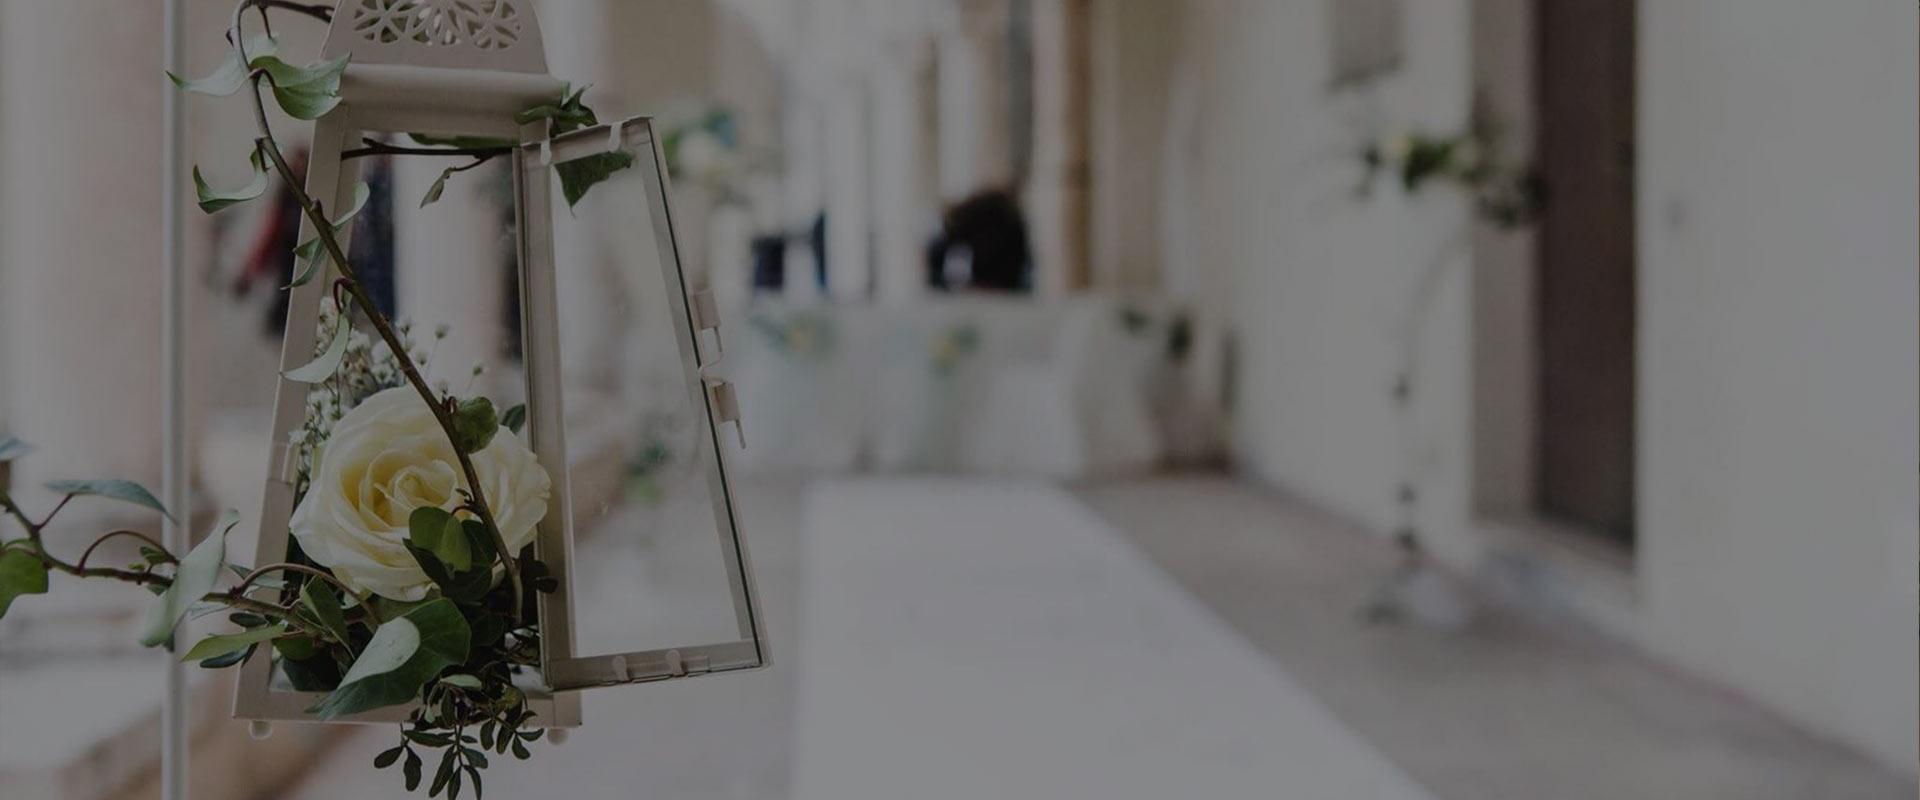 Blog Daniela Mengarelli | Event & Flower Design